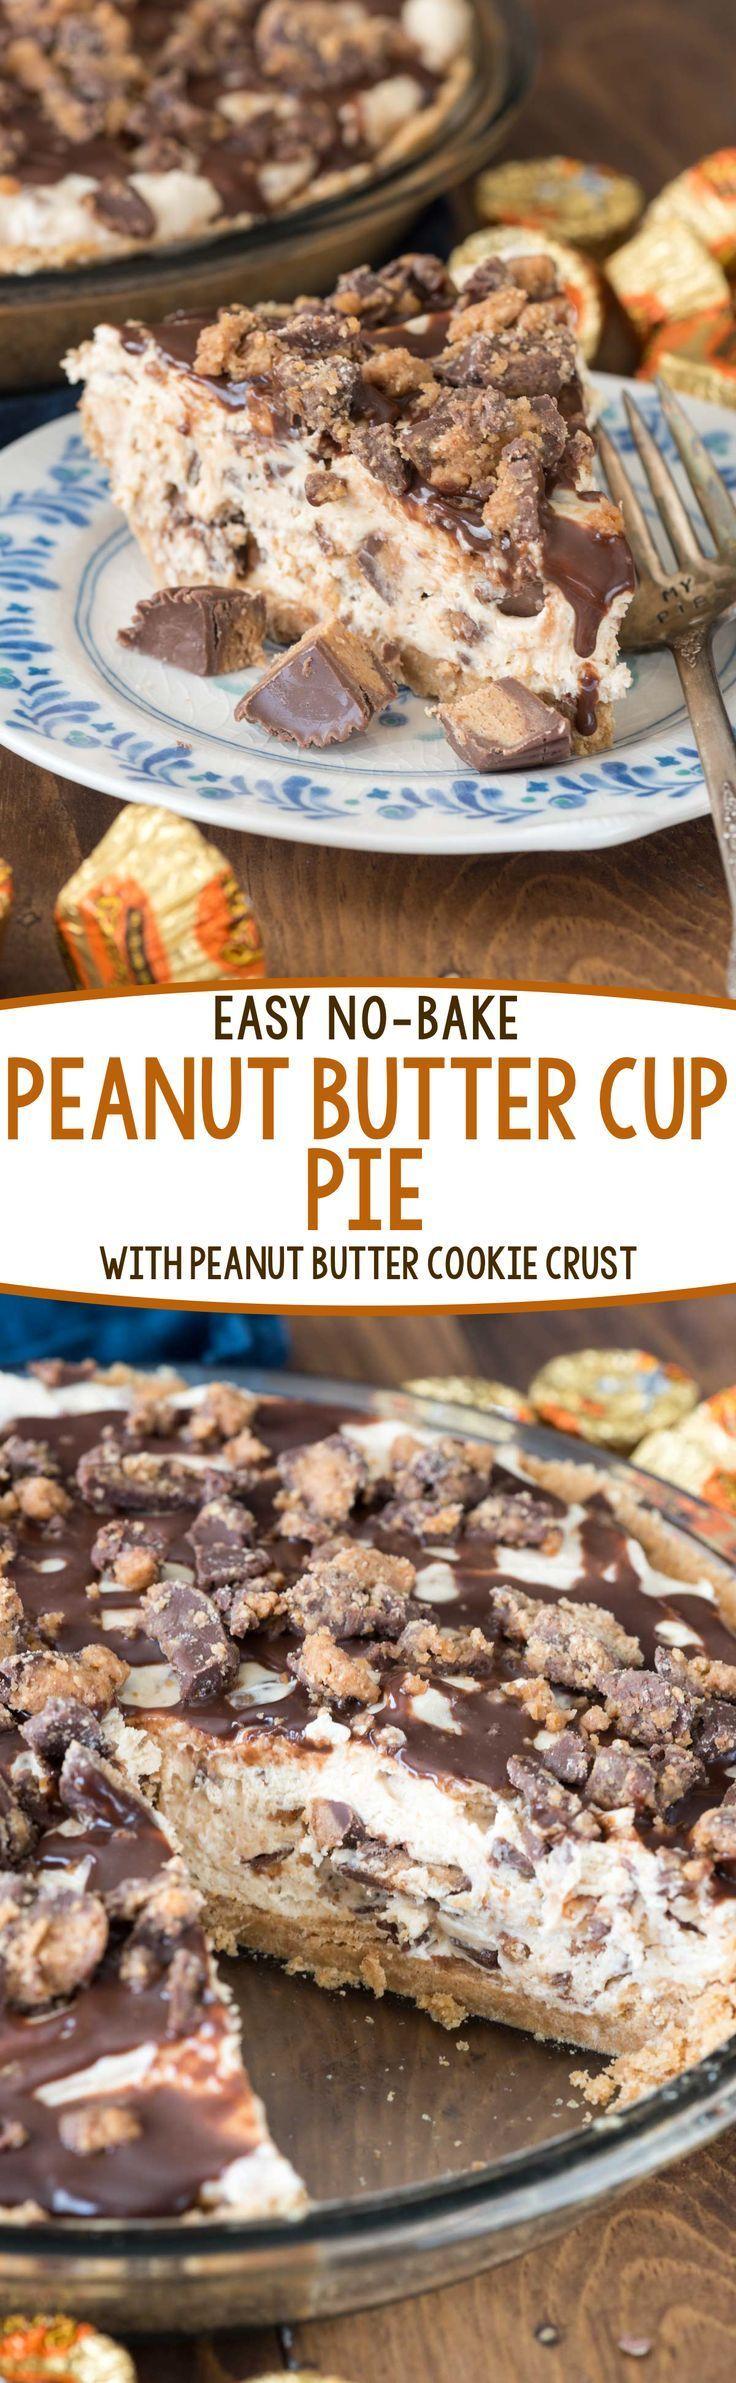 No Bake Peanut Butter Cup Pie | Recipe | Pie recipes, Peanut butter ...